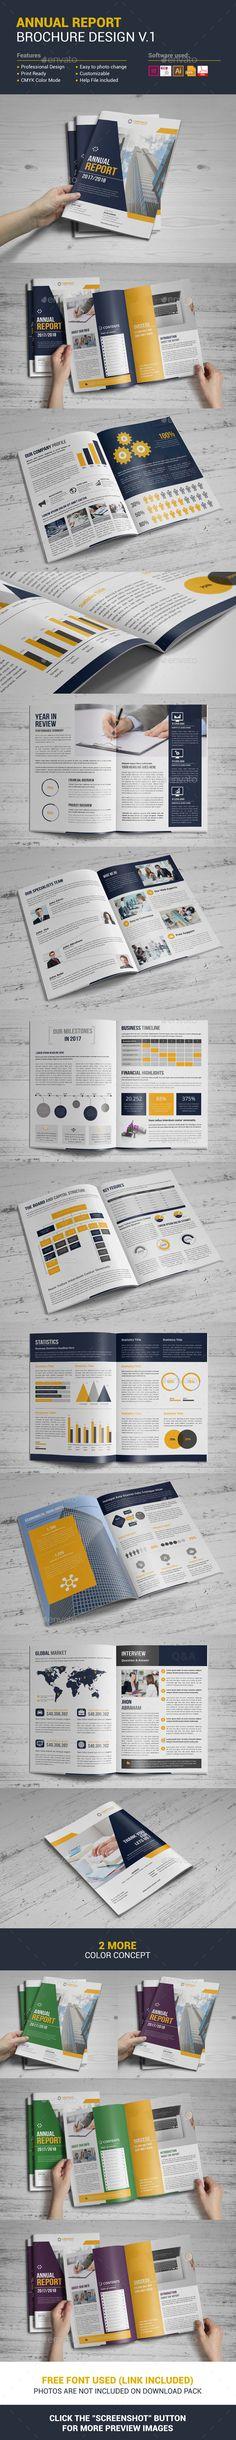 proposal report template%0A Portfolio  Portfolio Brochures   Proposal Template   Pinterest   Indesign  templates  Brochures and Brochure template